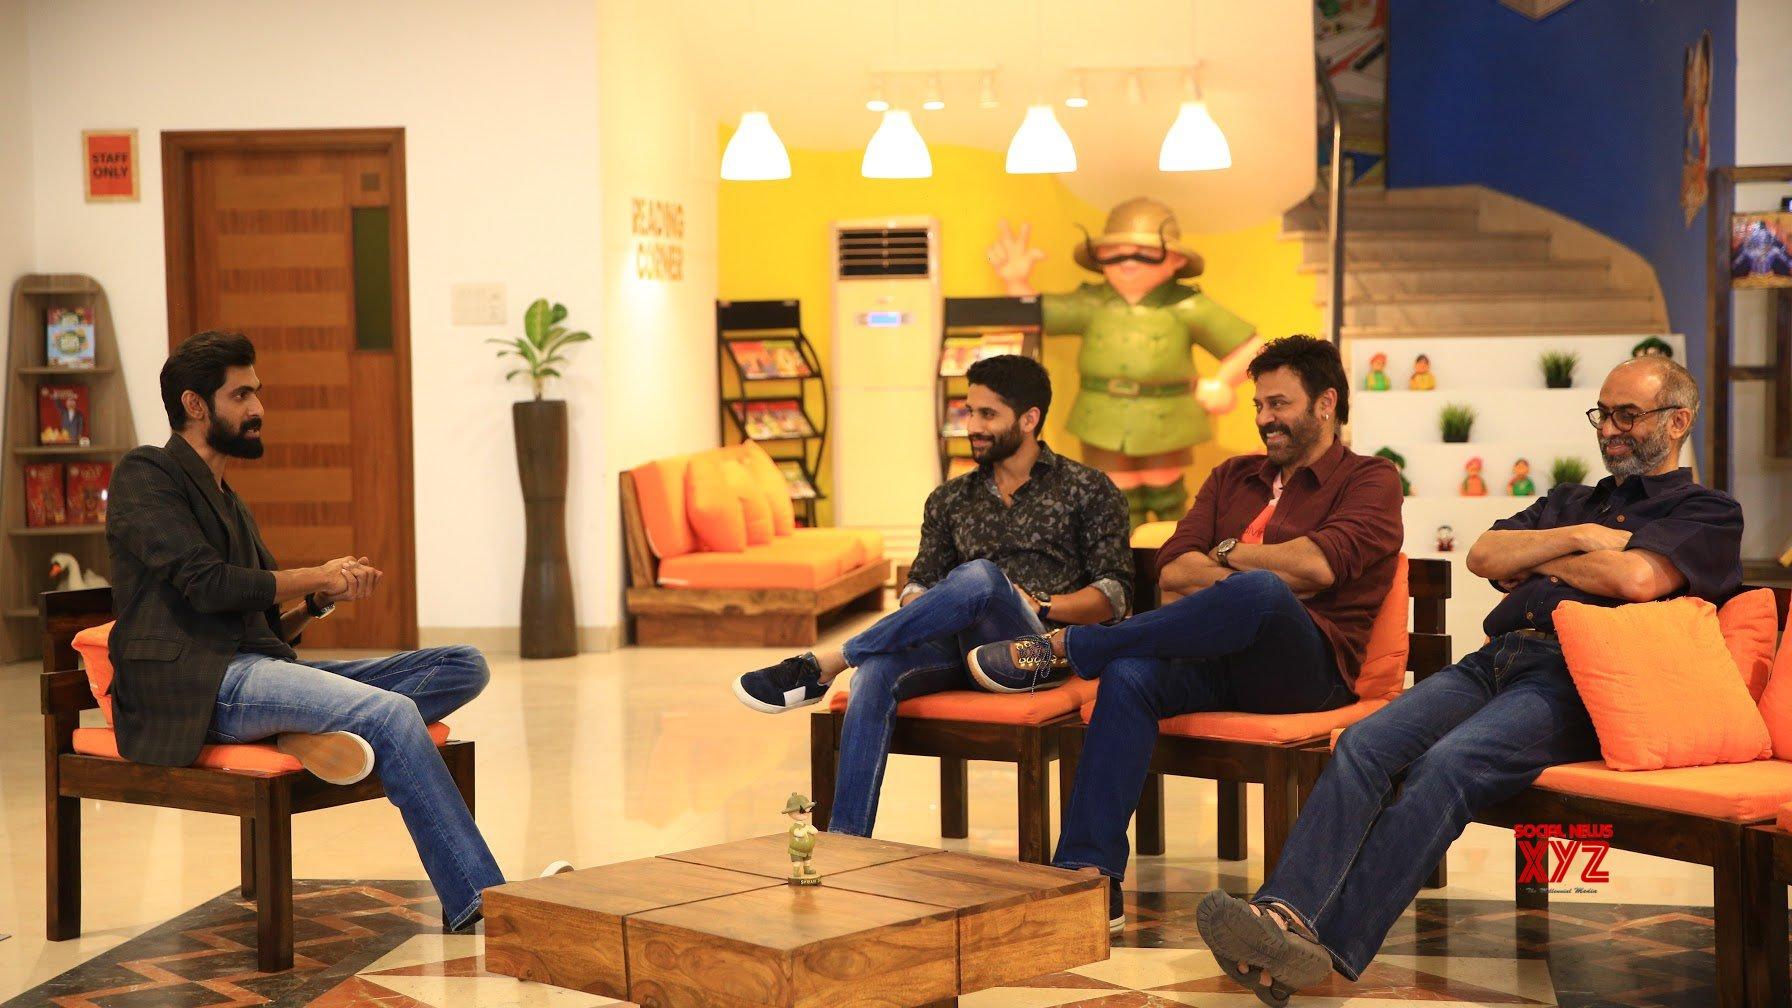 Newz-Rana interviews Venkatesh, Suresh Babu and Naga Chaitanya - Venky Mama